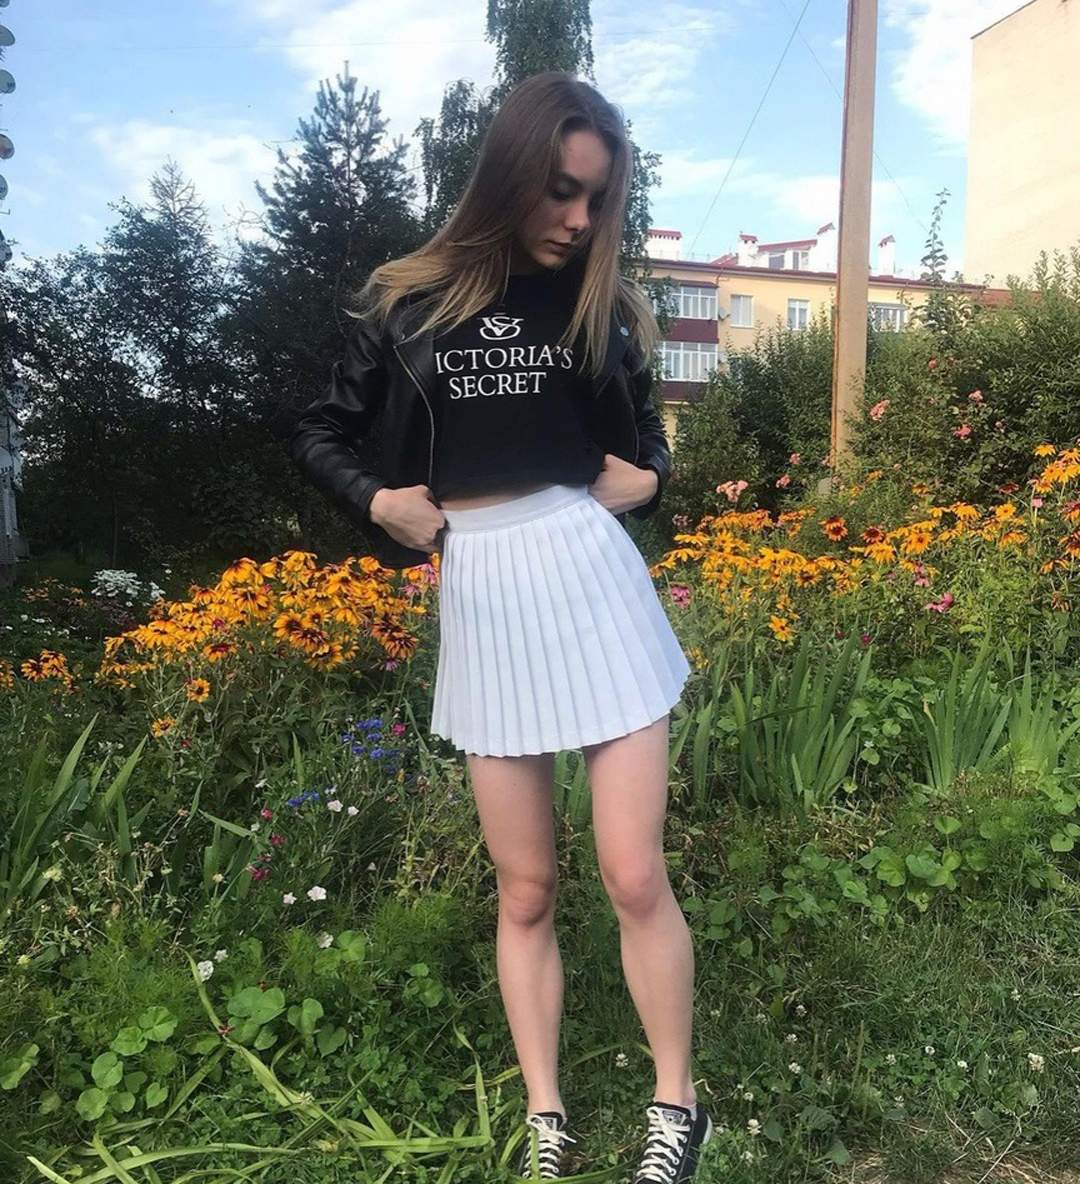 Christin-Black-Wallpapers-Insta-Fit-Bio-5